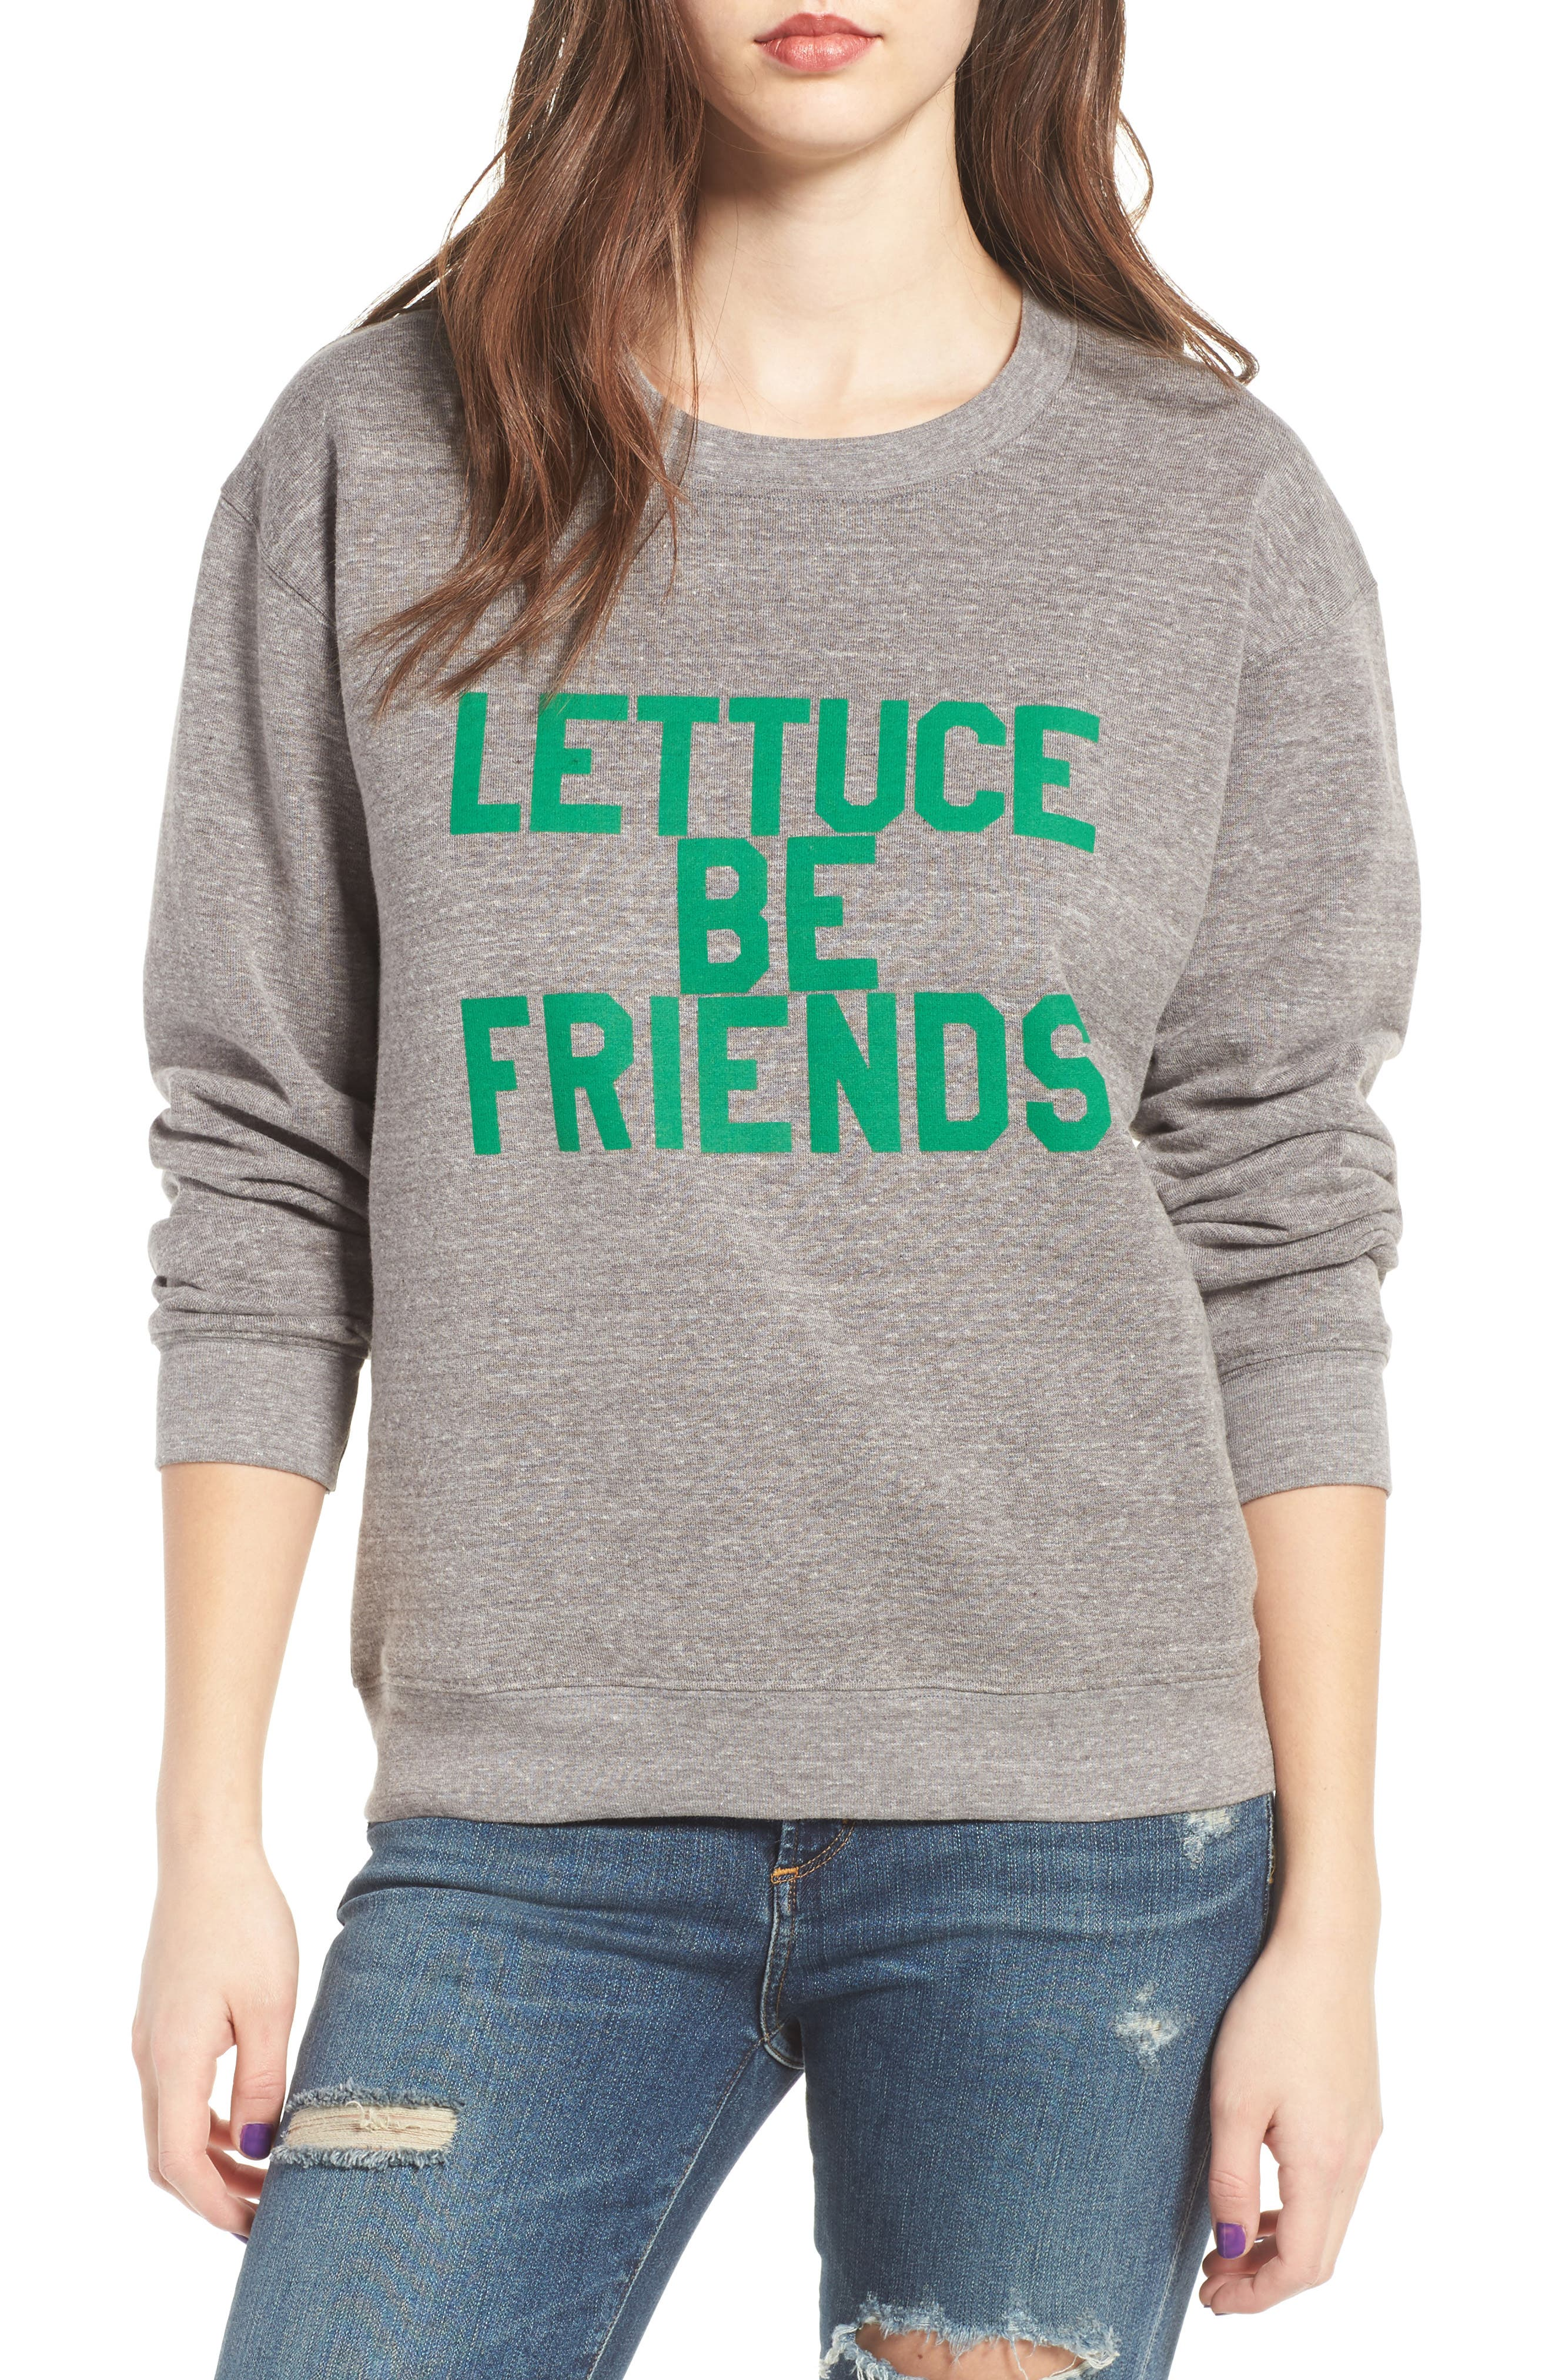 Lettuce Be Friends Sweatshirt,                         Main,                         color, 050